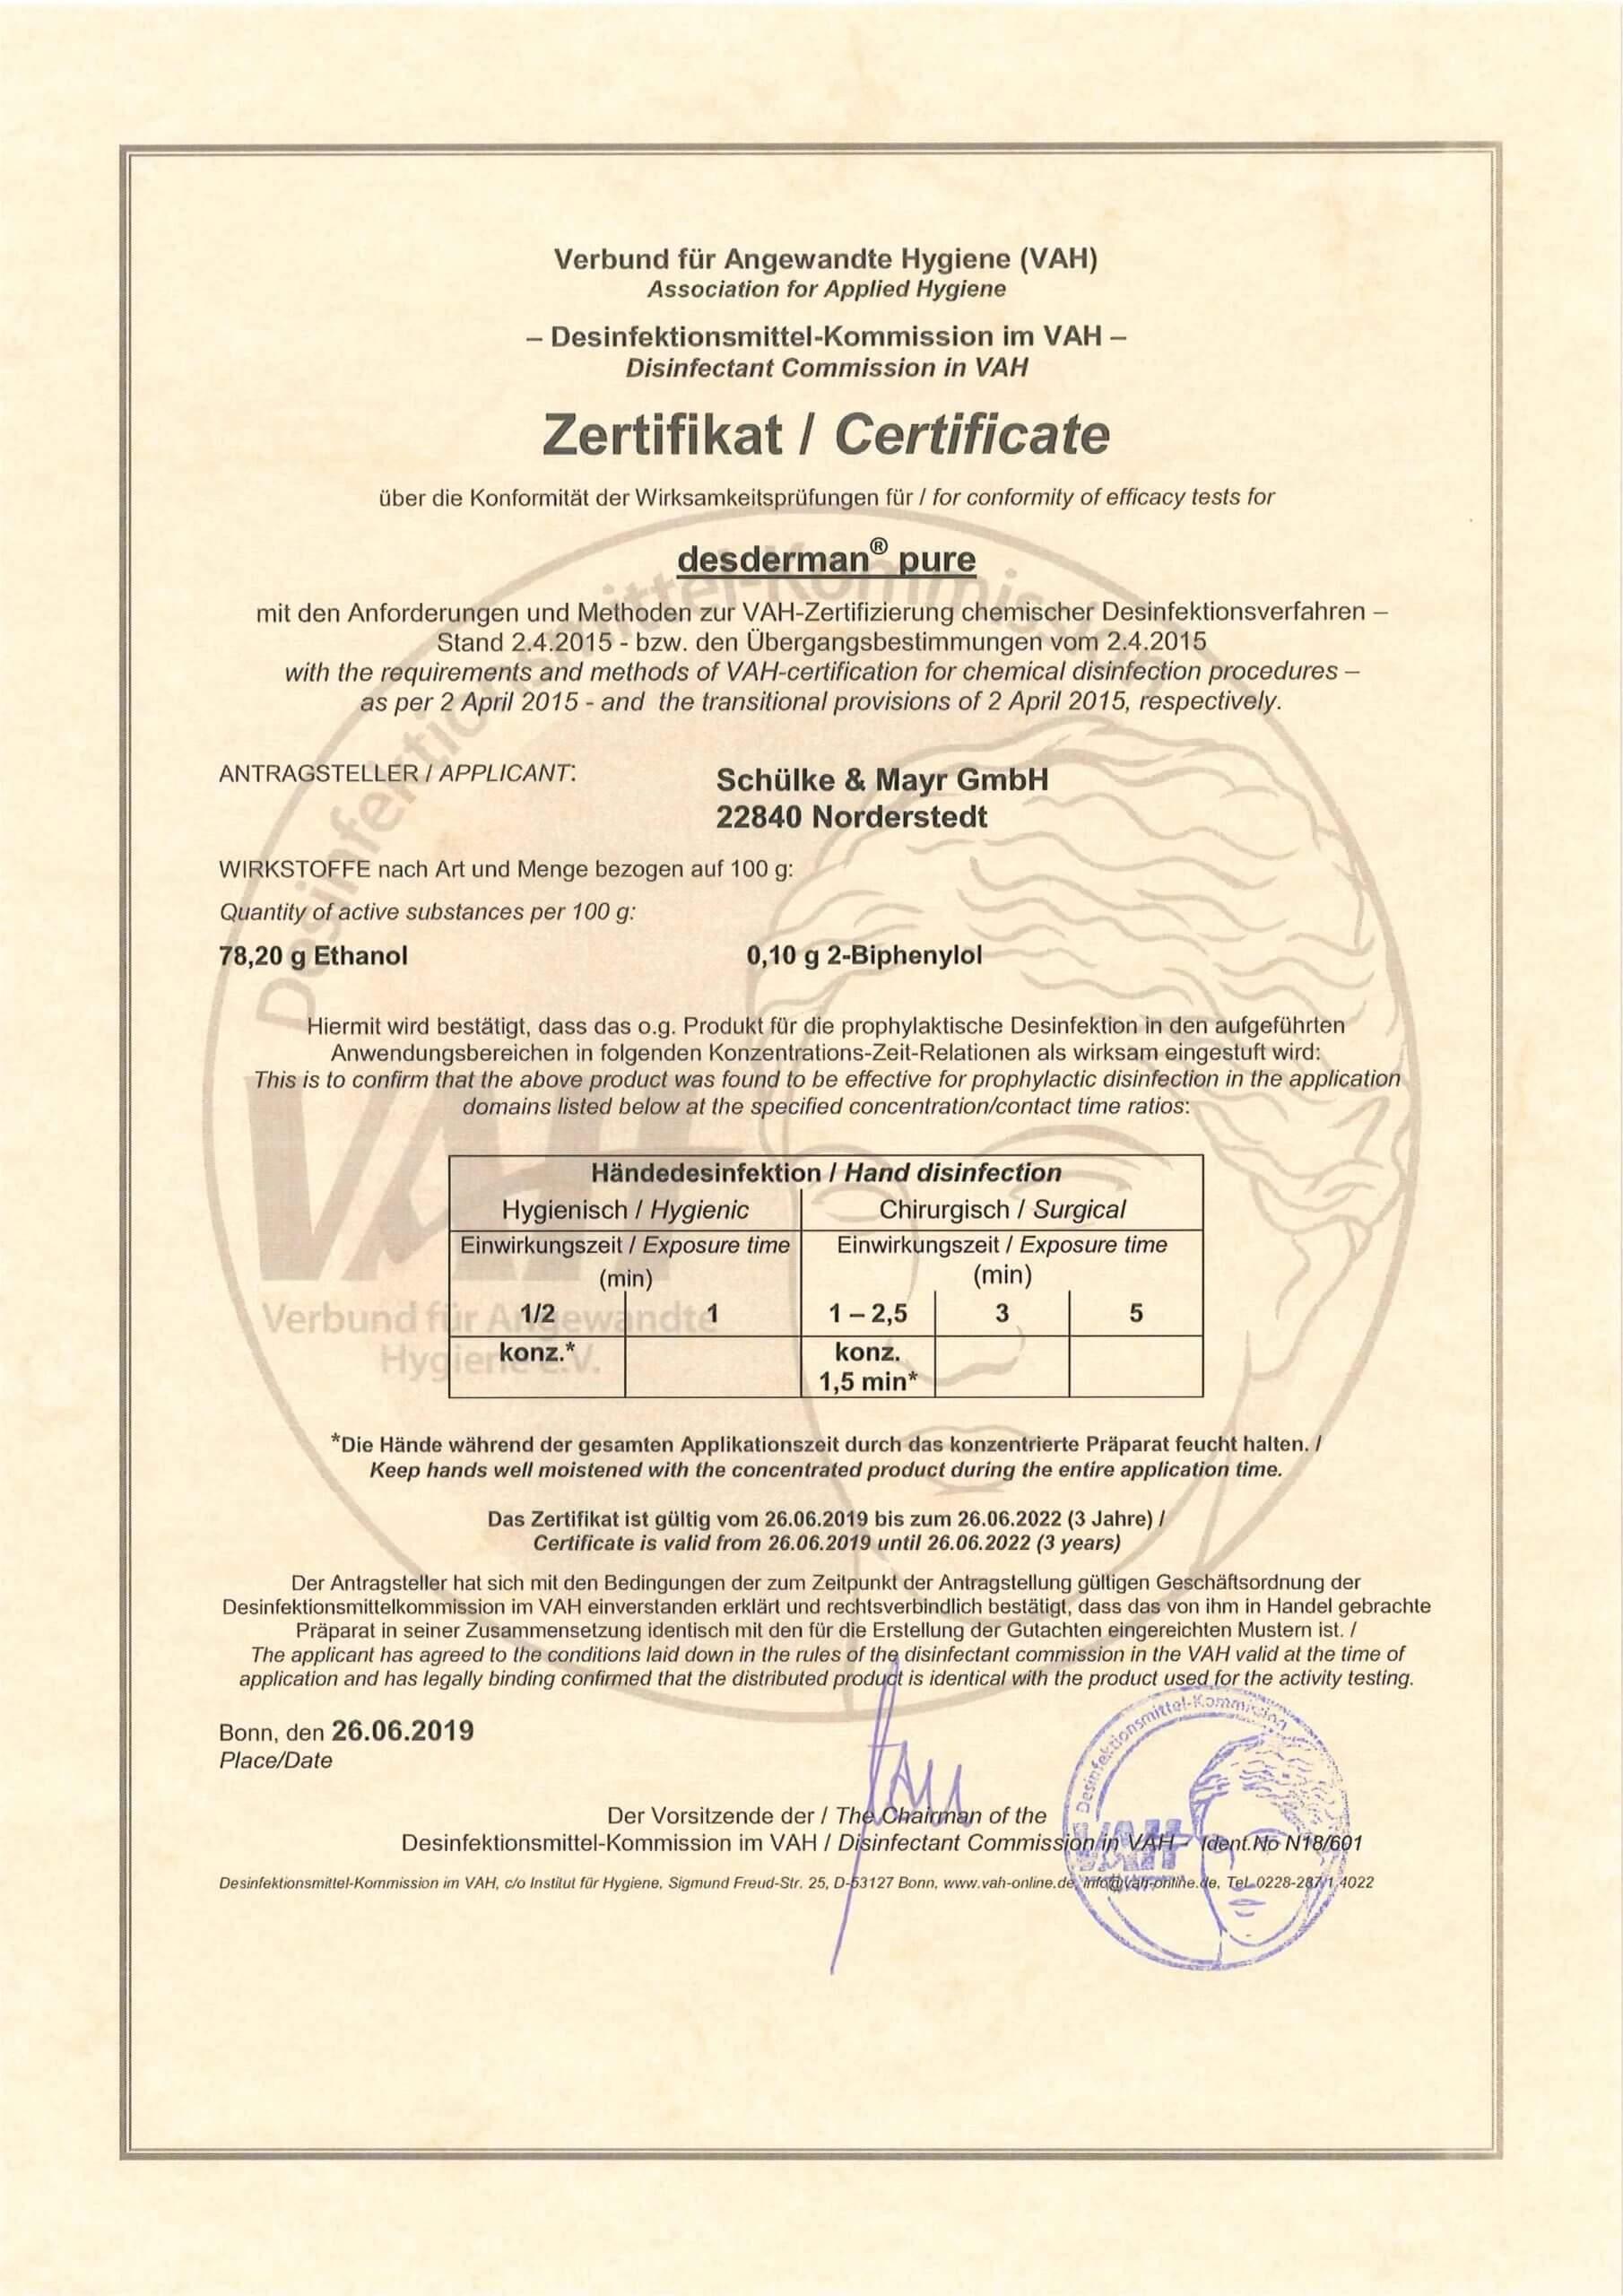 desderman pure_VAH_Zertifikat_gültig 26-06-2019 - 26.06.2022